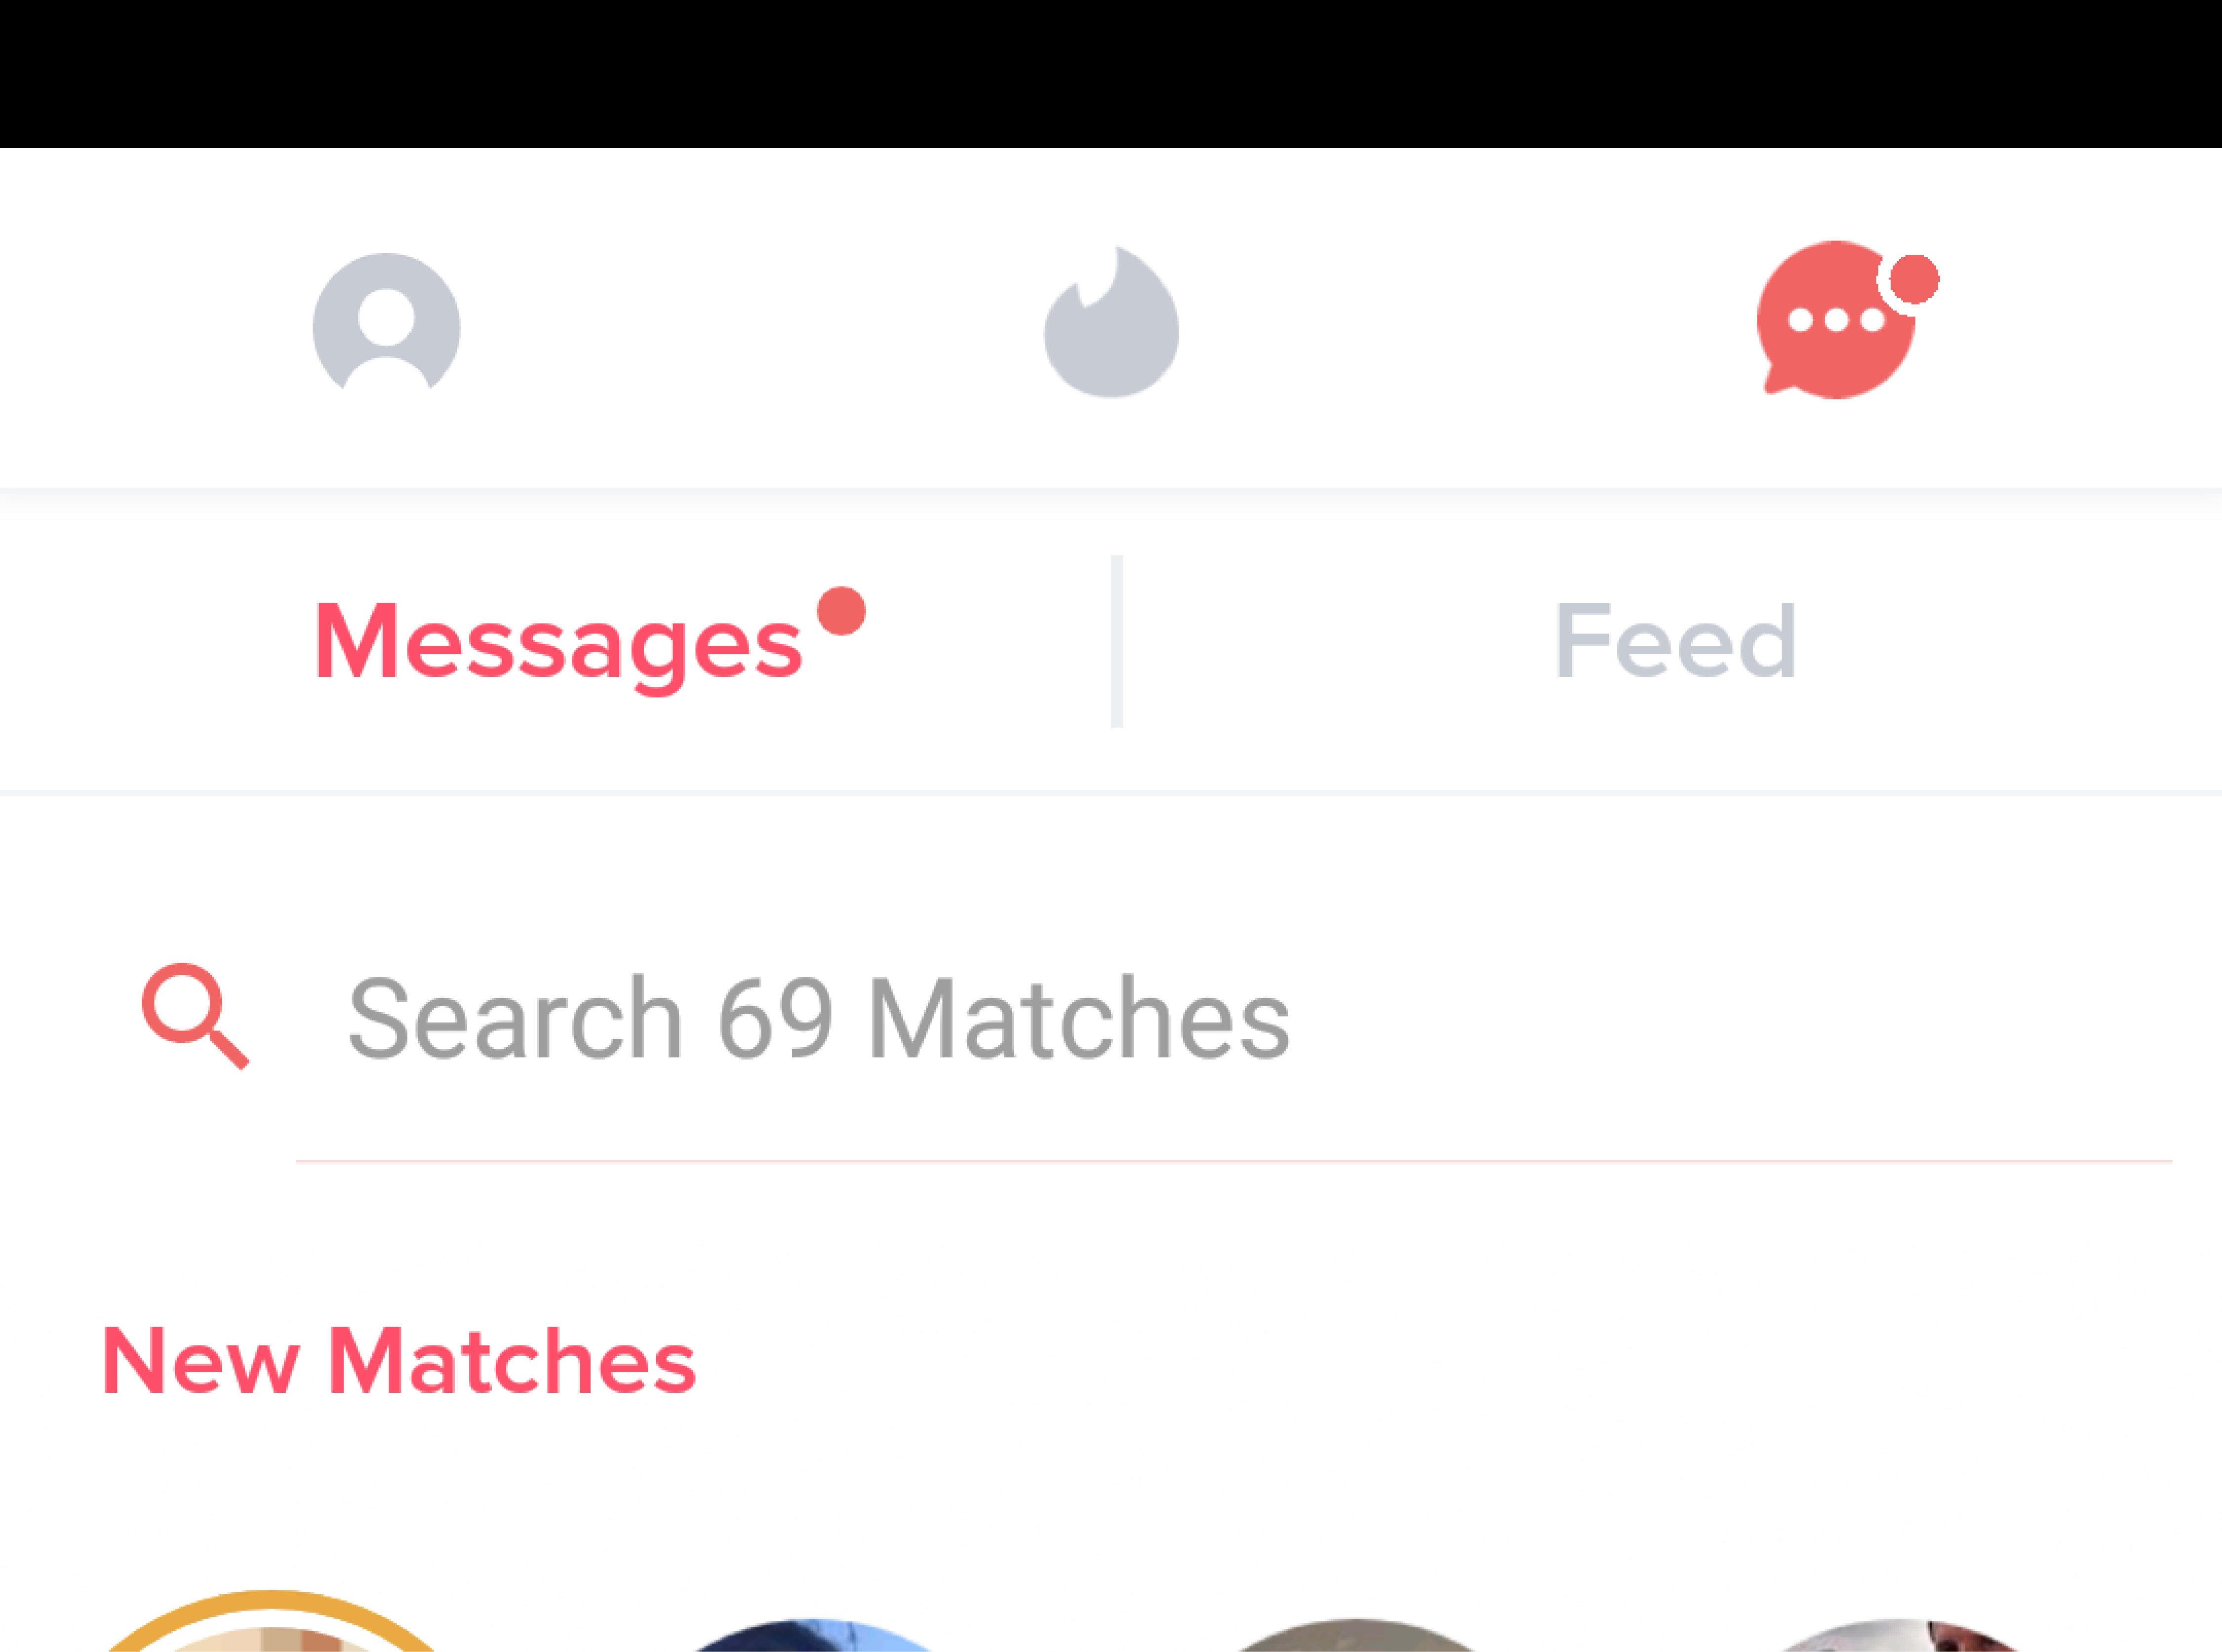 Sound tinder notification Tinder don't